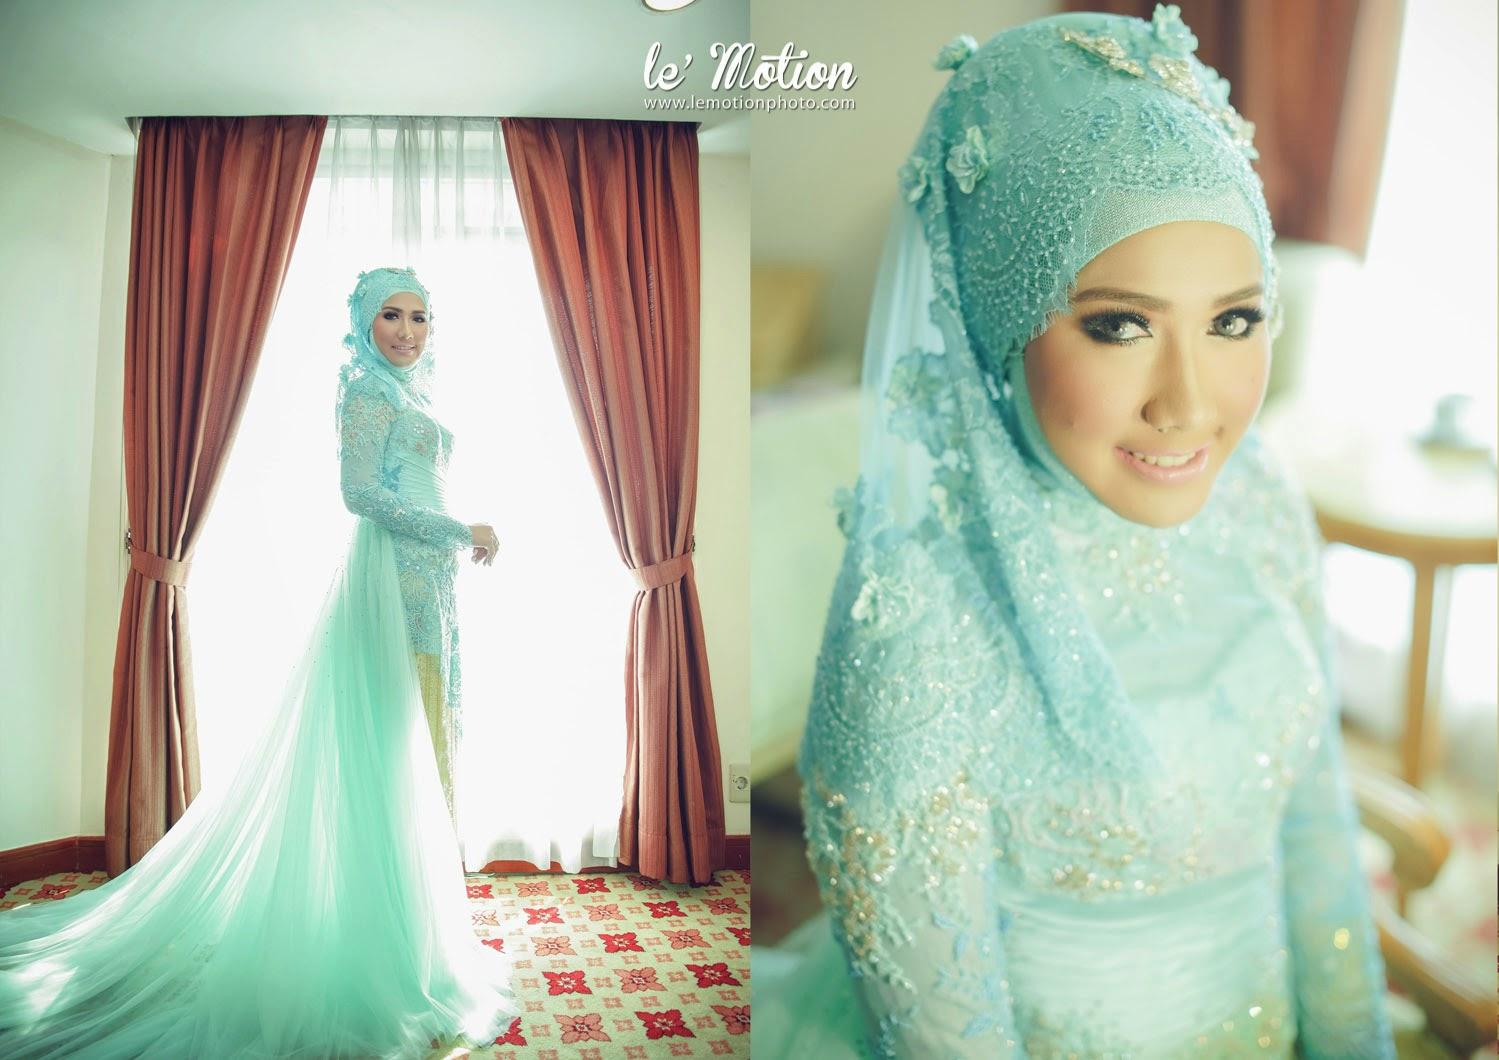 http://delbaraneh.com/wp-content/uploads/2016/06/islamic-wedding-gowns-hijab-2.jpg